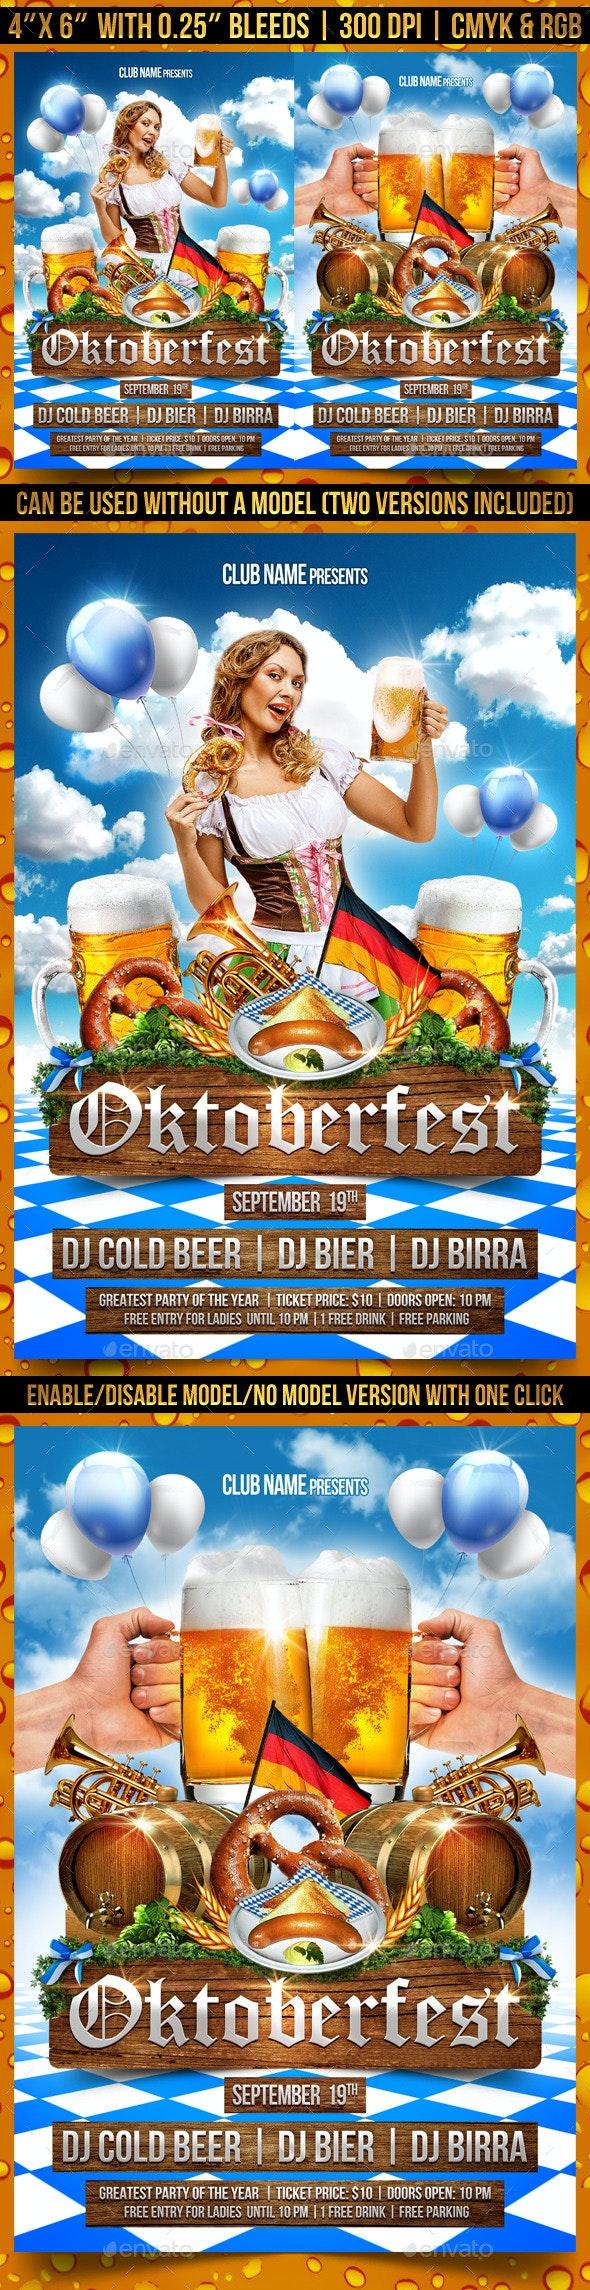 Oktoberfest Party Flyer Template - Clubs & Parties Events